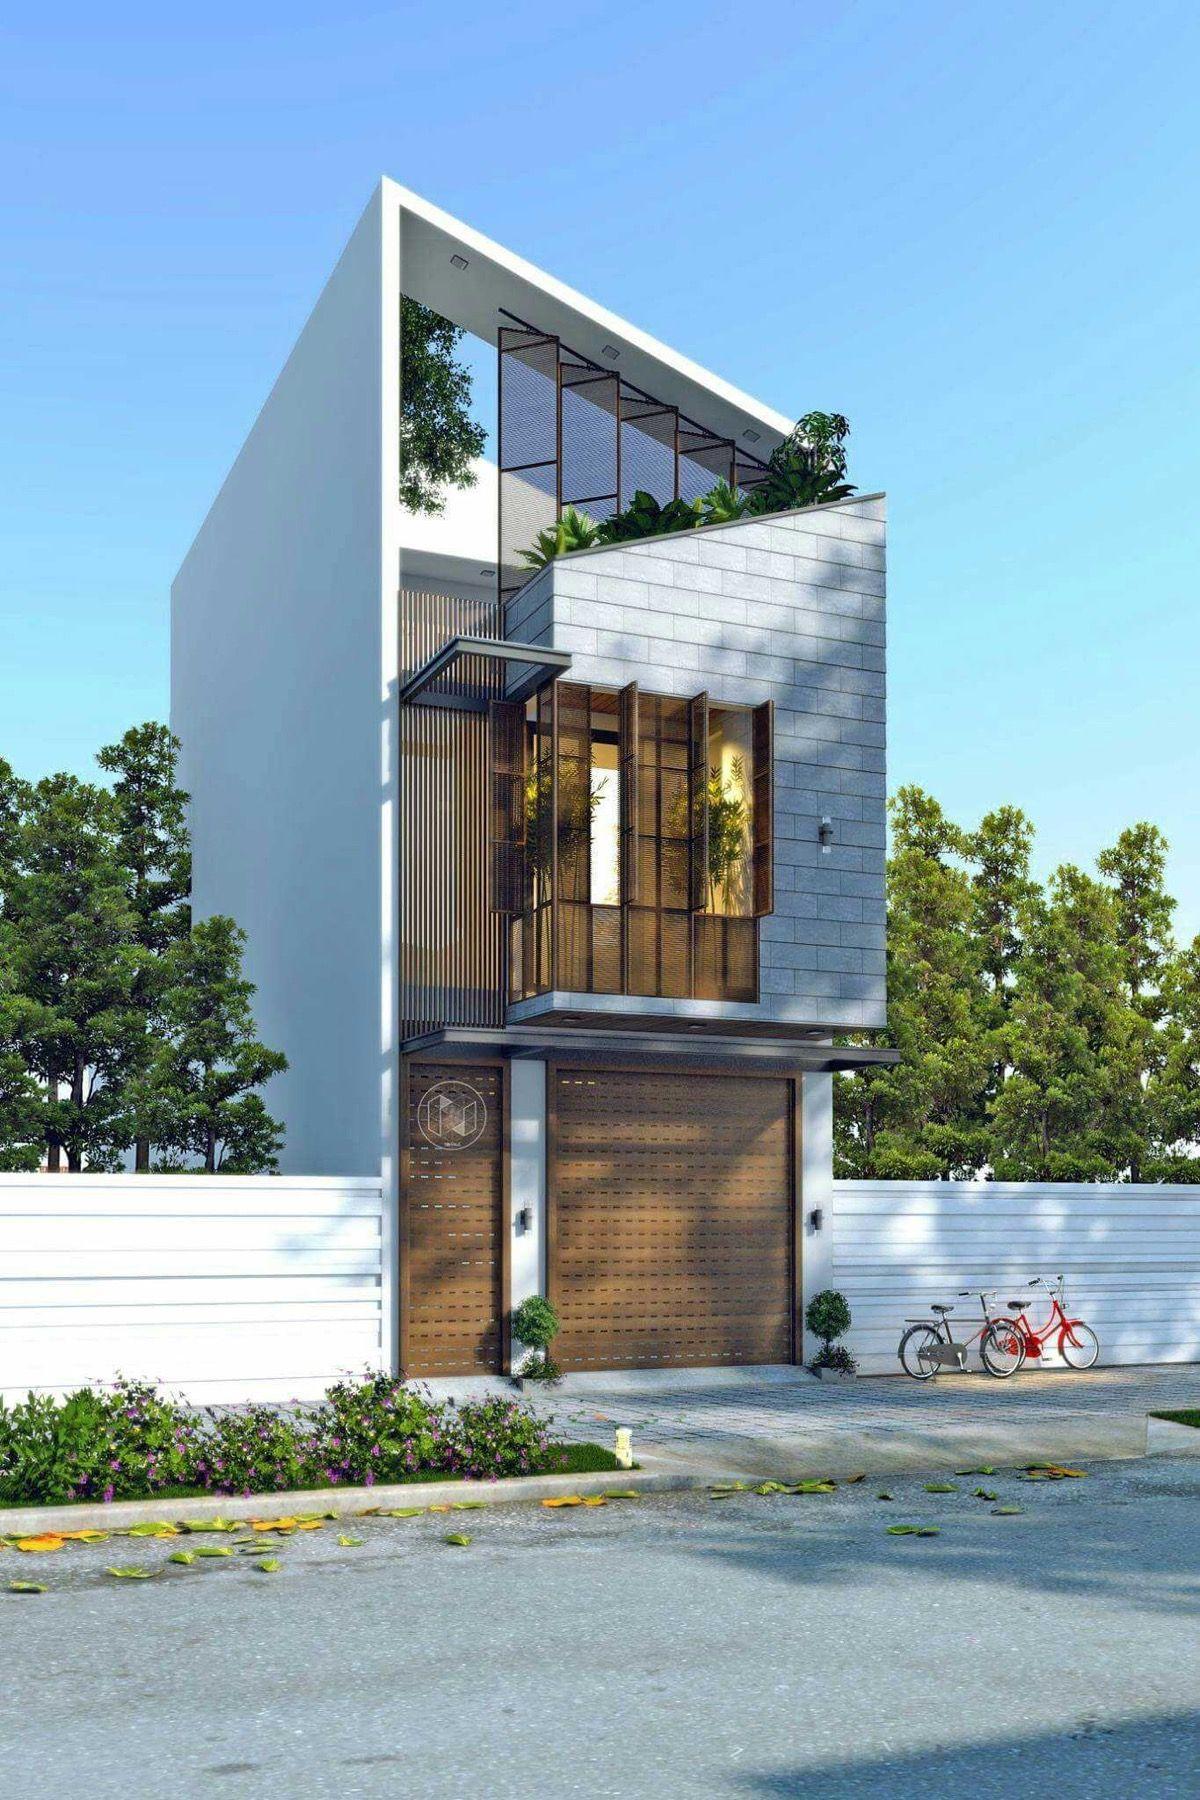 Home Design Ideas Elevation: 50 Narrow Lot Houses That Transform A Skinny Exterior Into